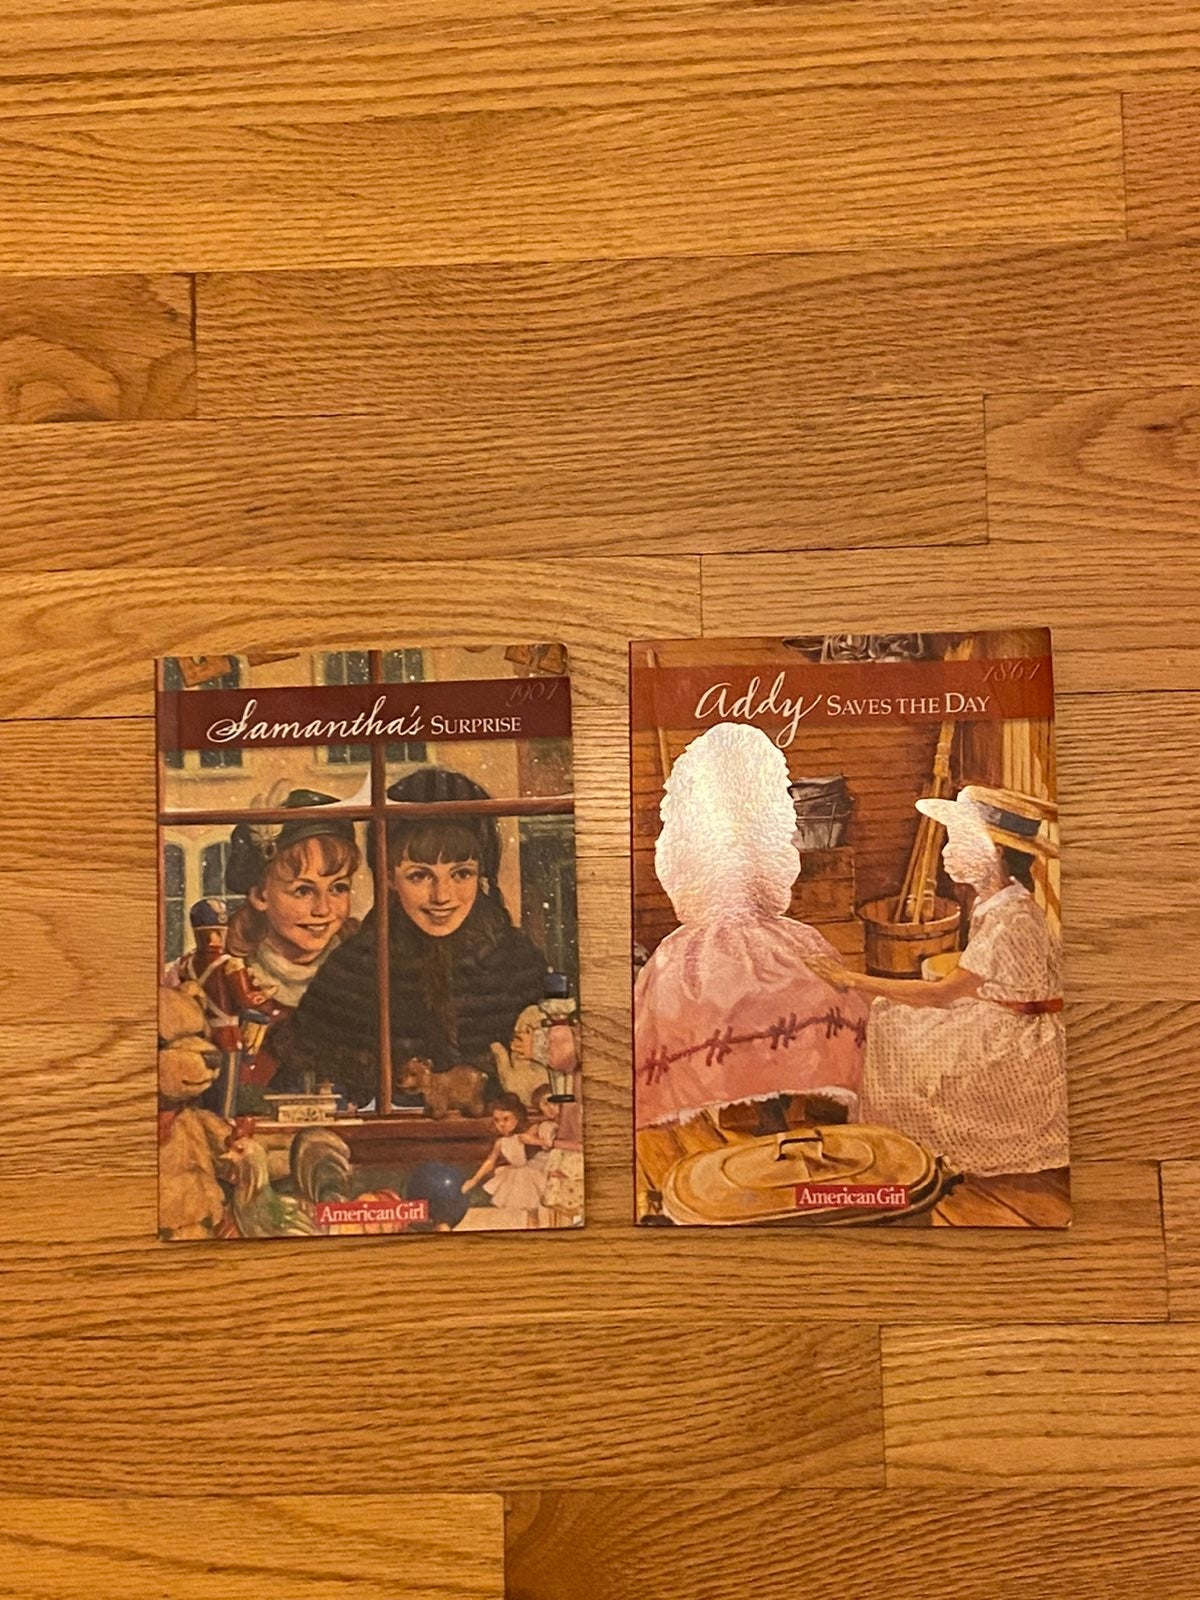 American Girl books